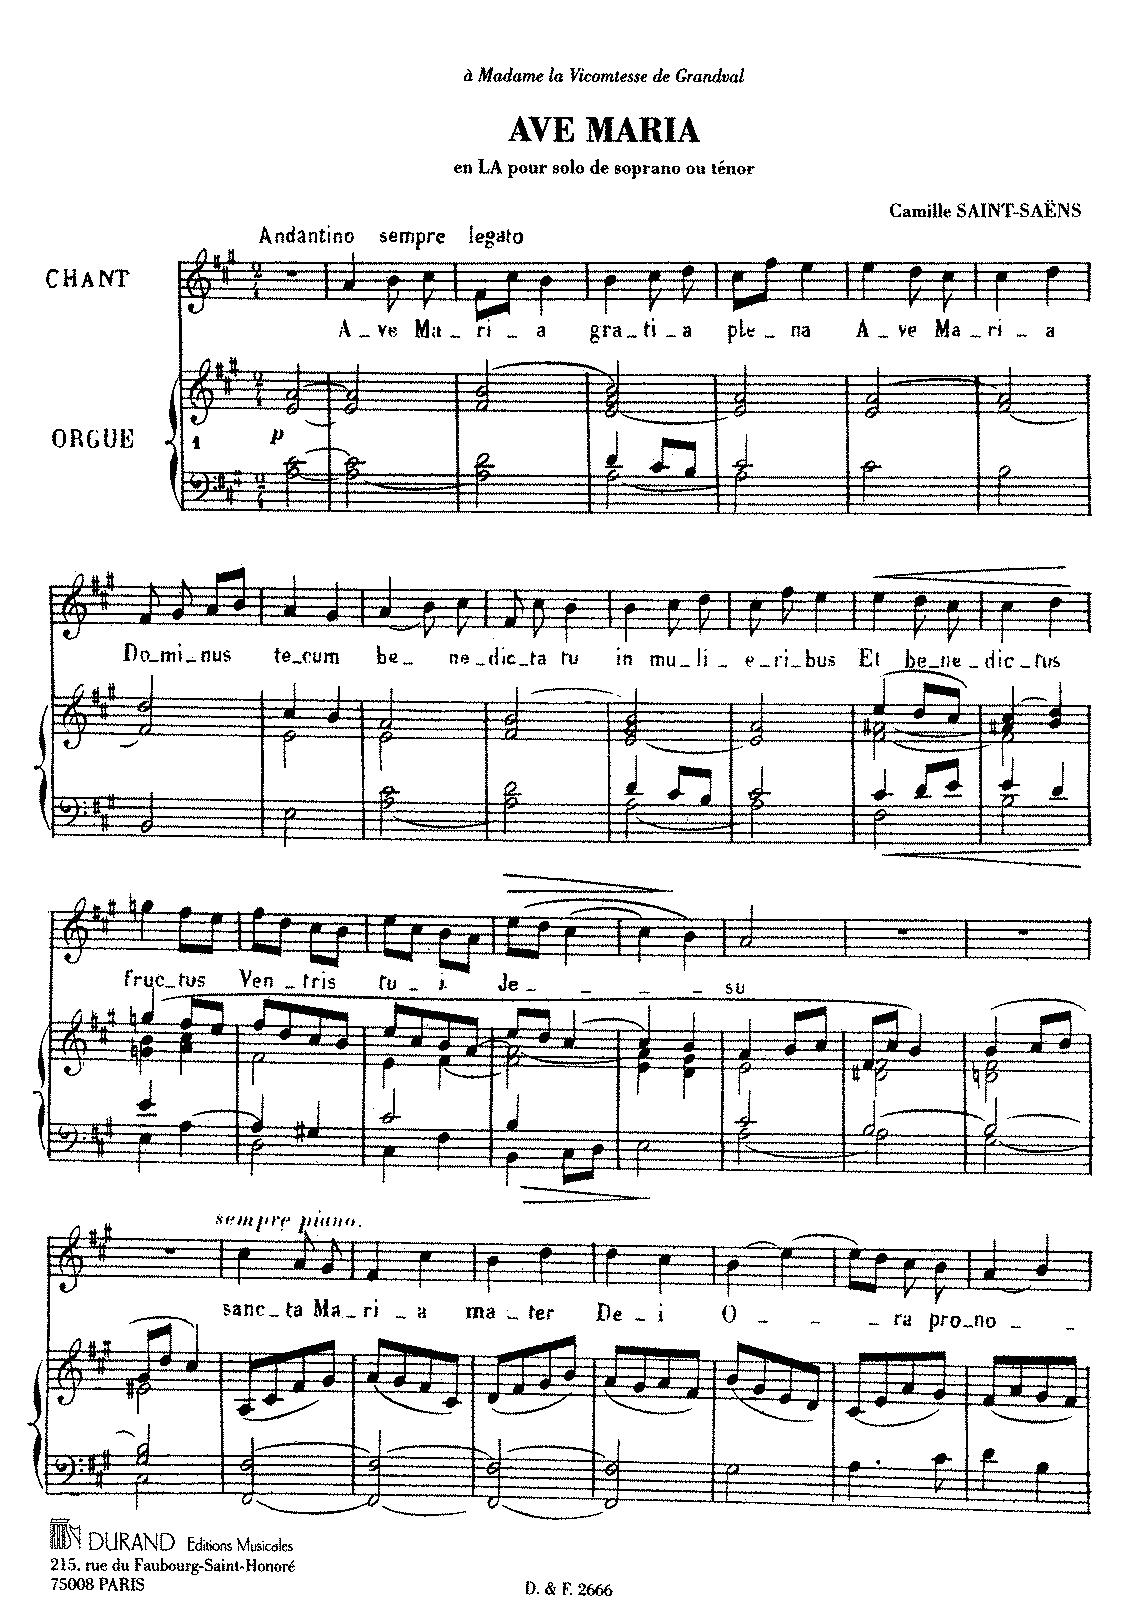 PMLP85520-Saint-Saëns - Ave Maria in A (1865).pdf | Mezzo sopraan in ...